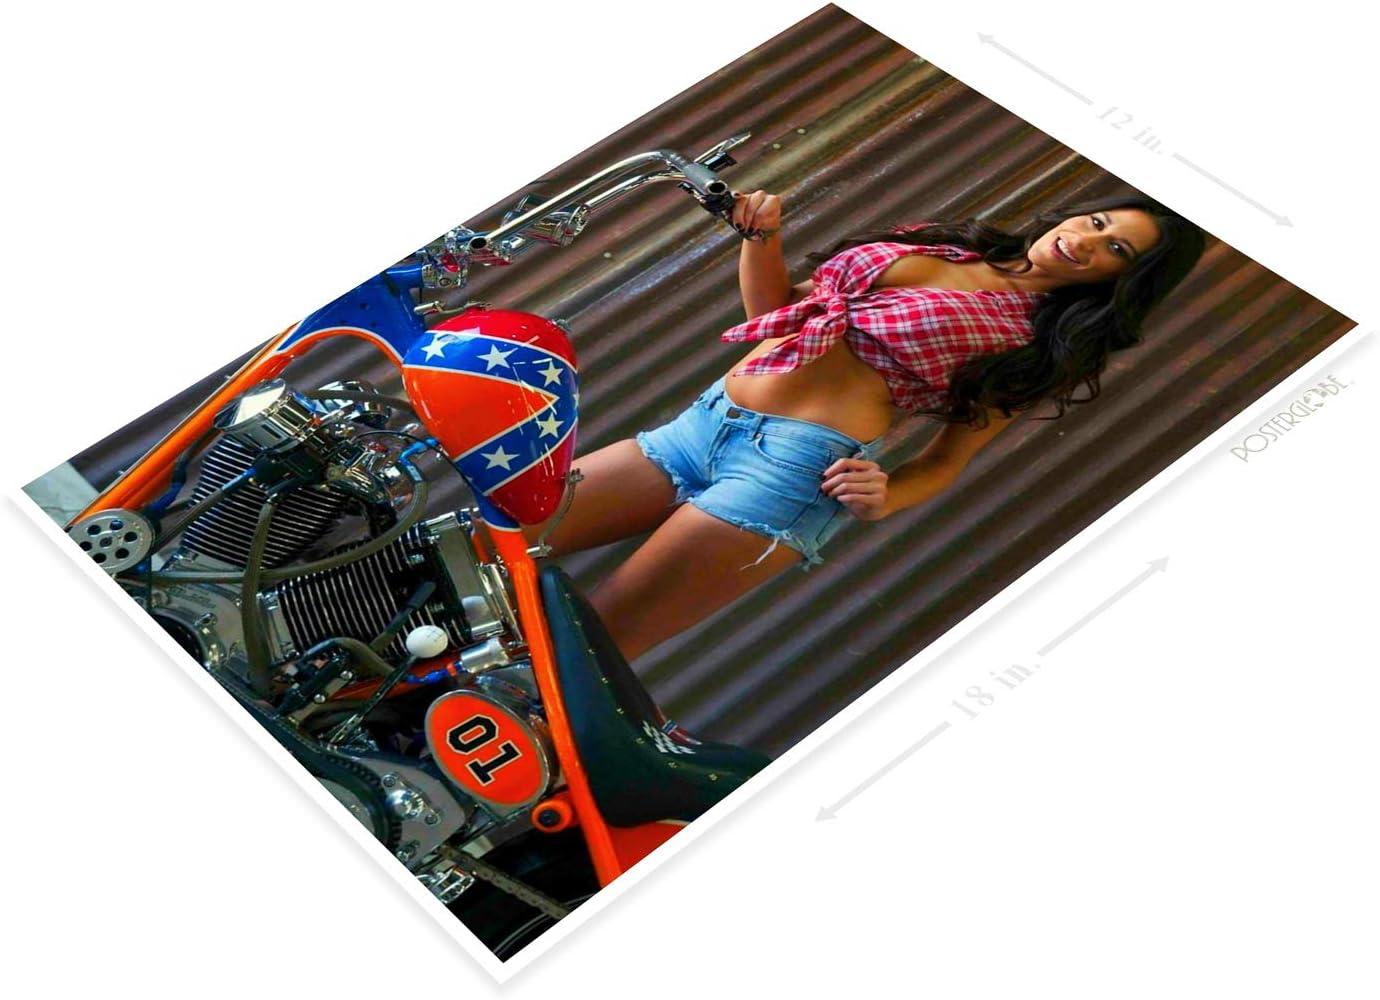 Daisy Dukes Country Pin-up Girl Farm Tractor Pin-up Decor Tin Sign B605